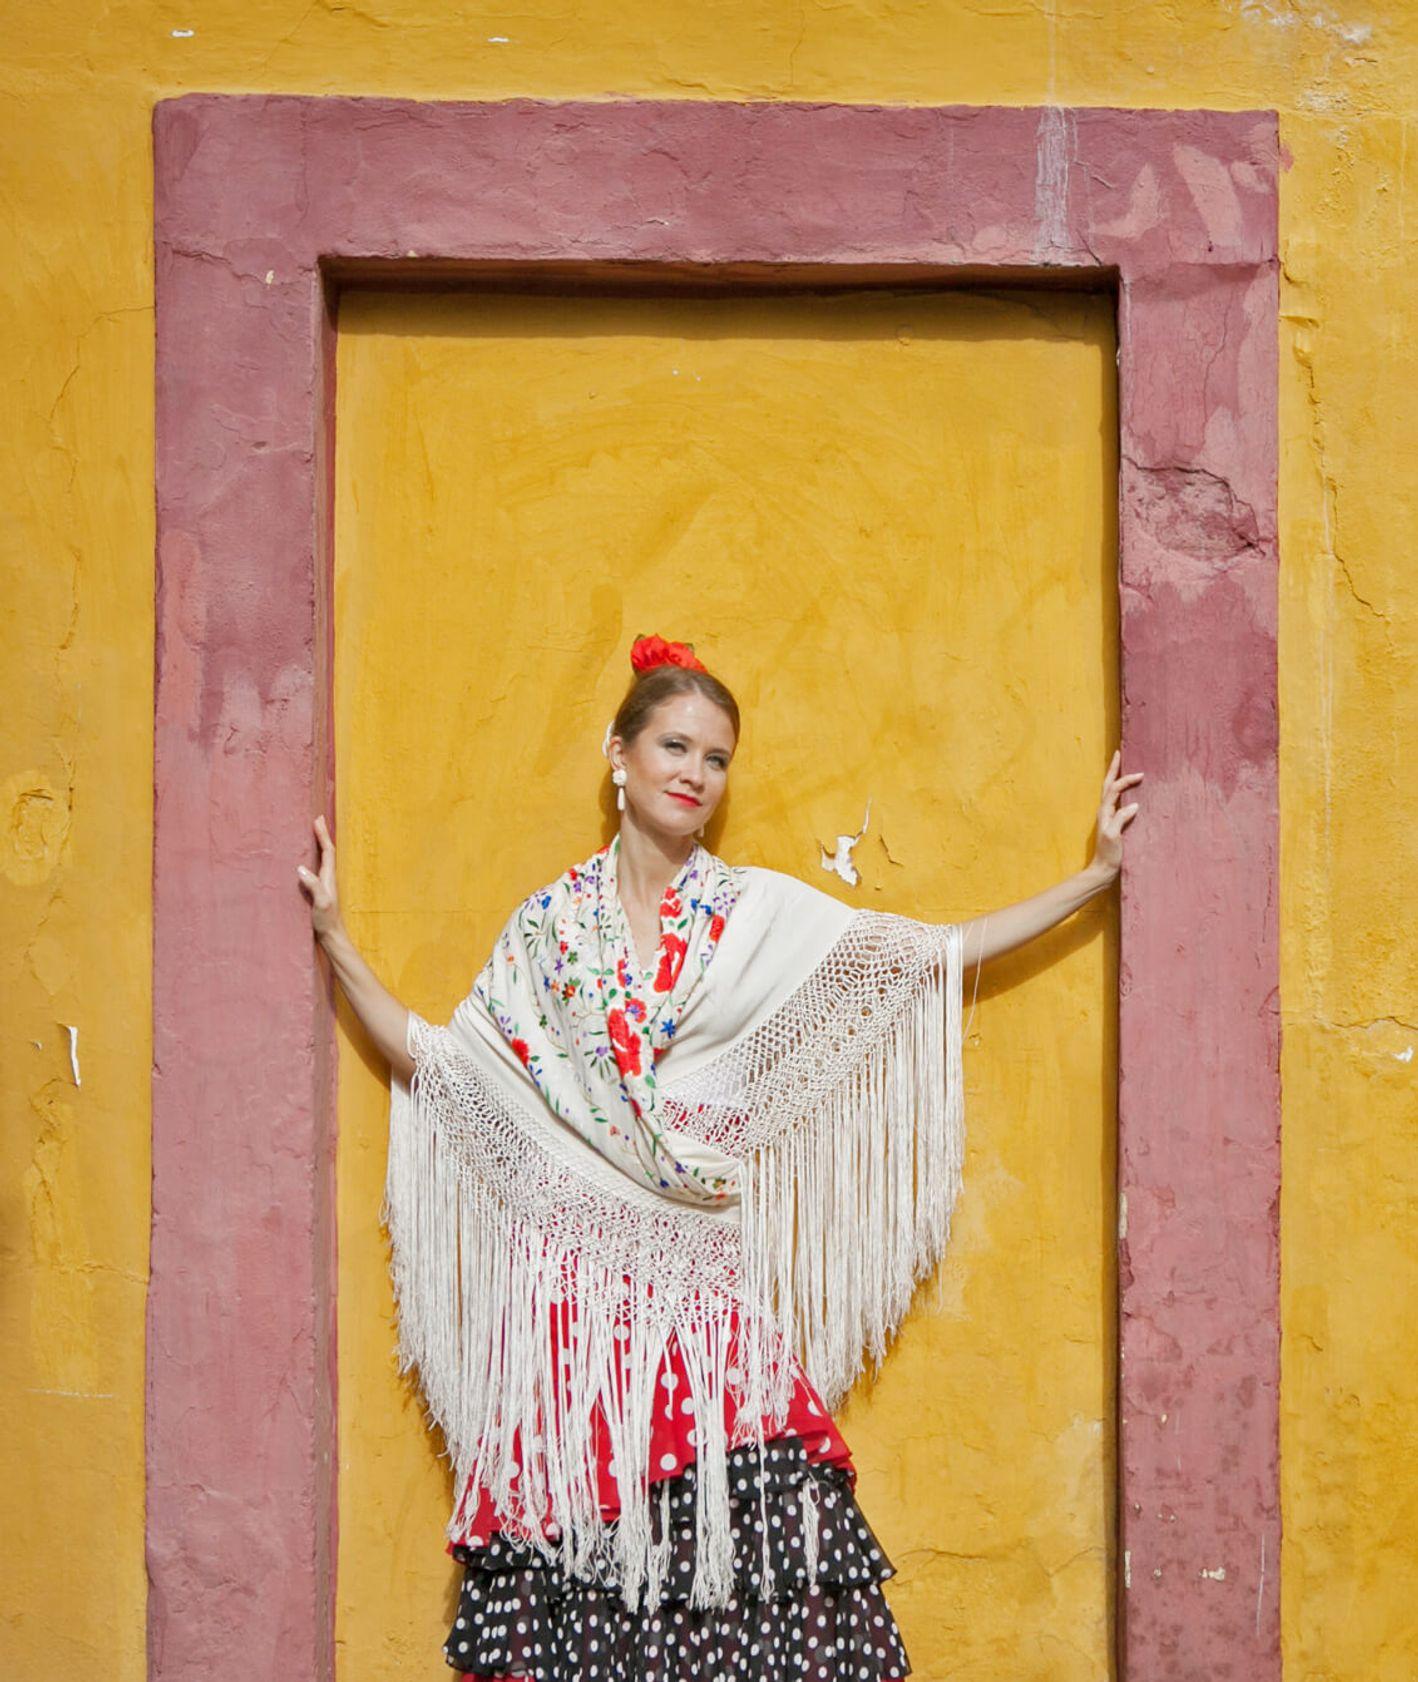 Emilia, tancerka flamenco w Sewilli (fot. Julia Zabrodzka)